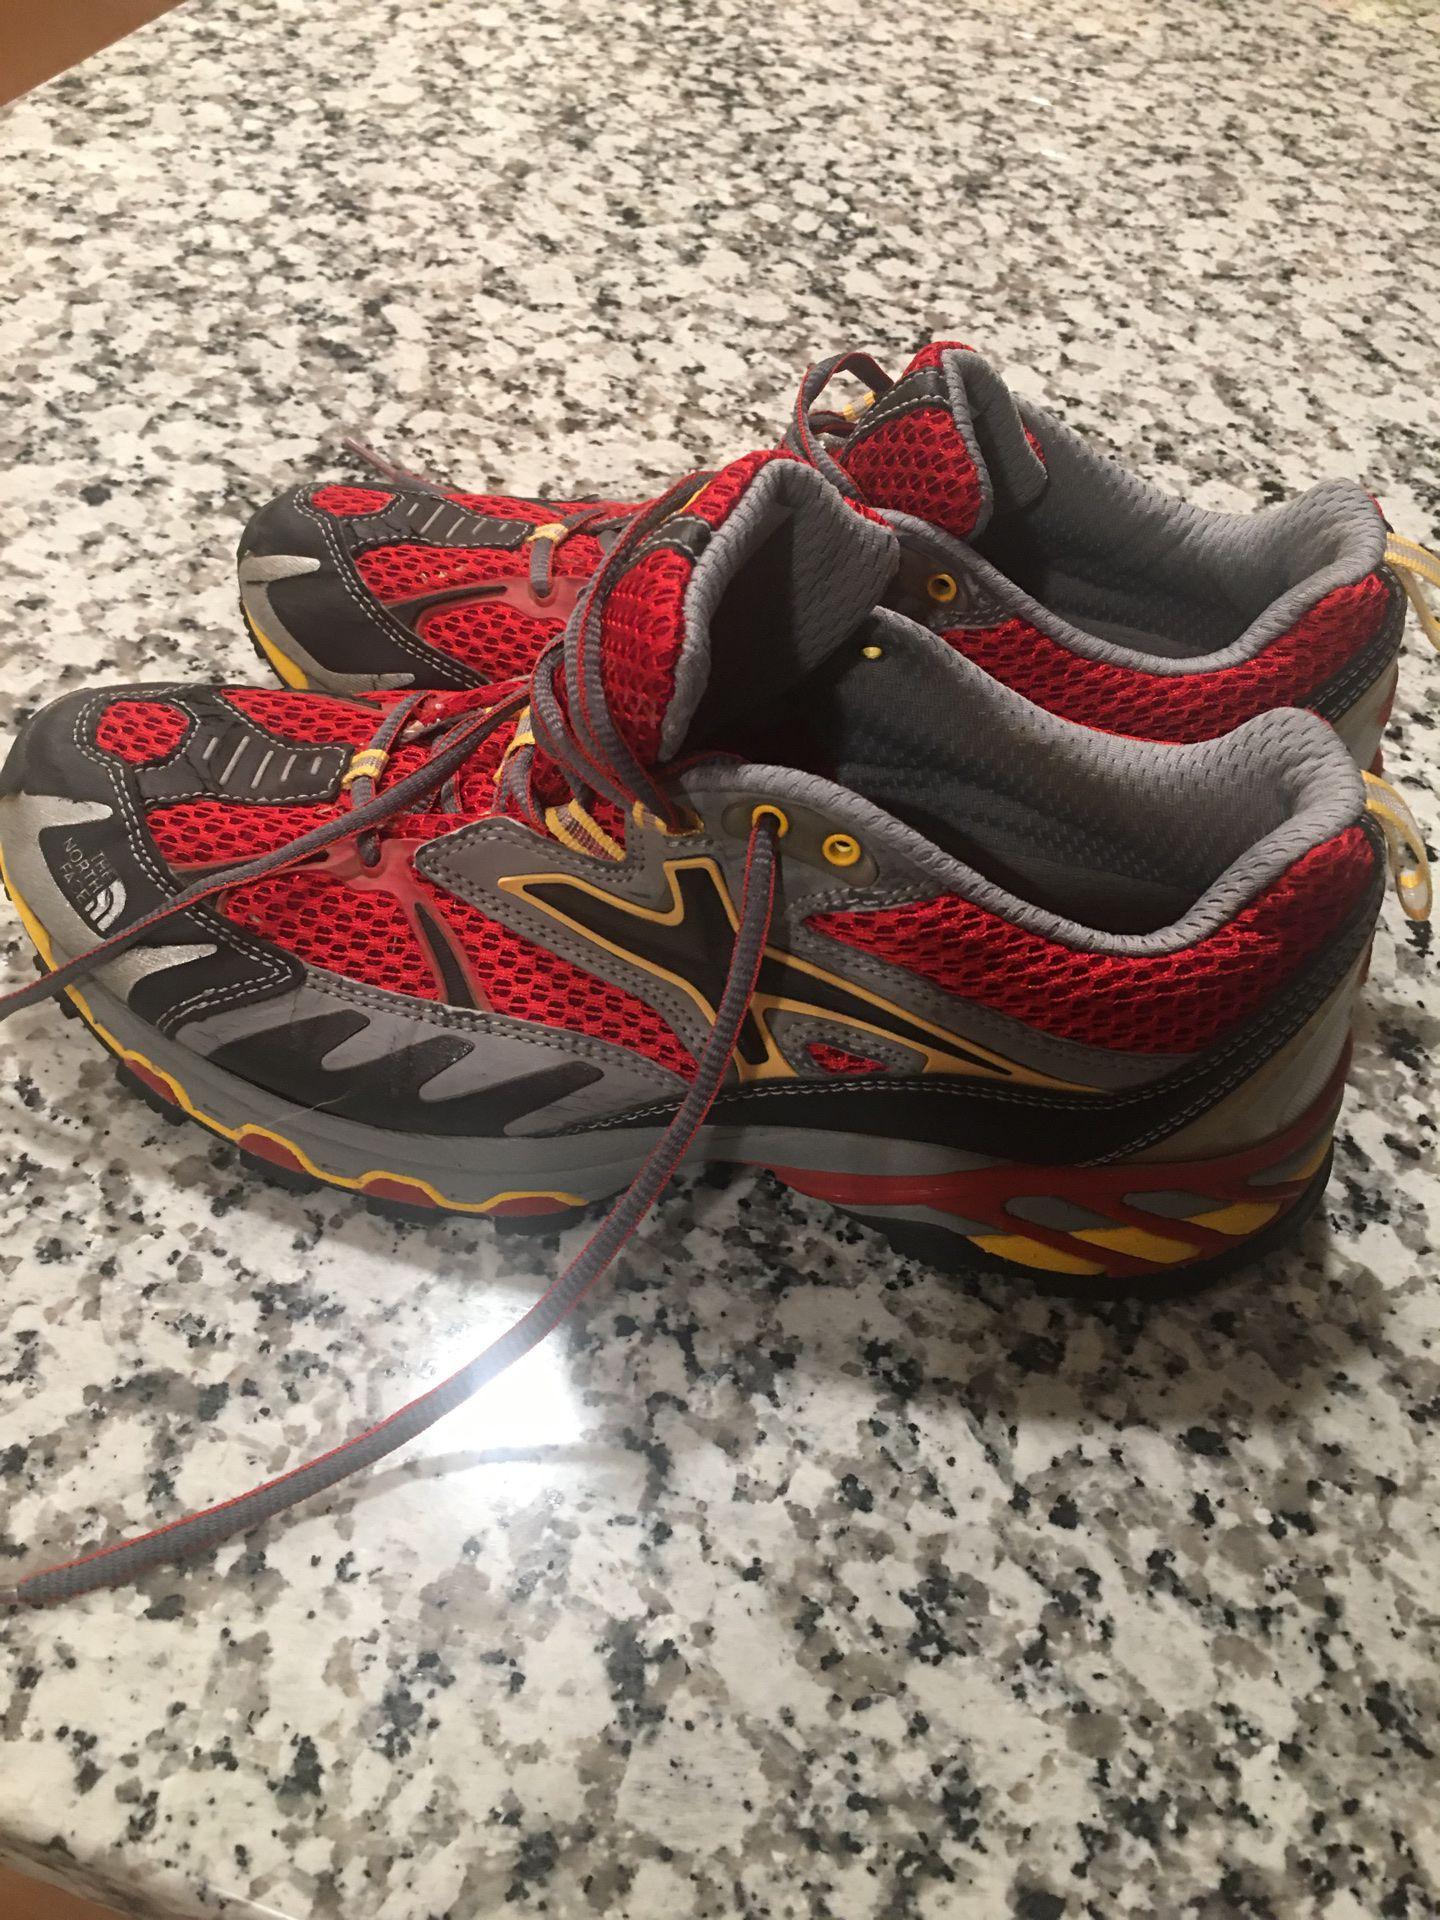 Northface Men's running shoes, 8 1/2